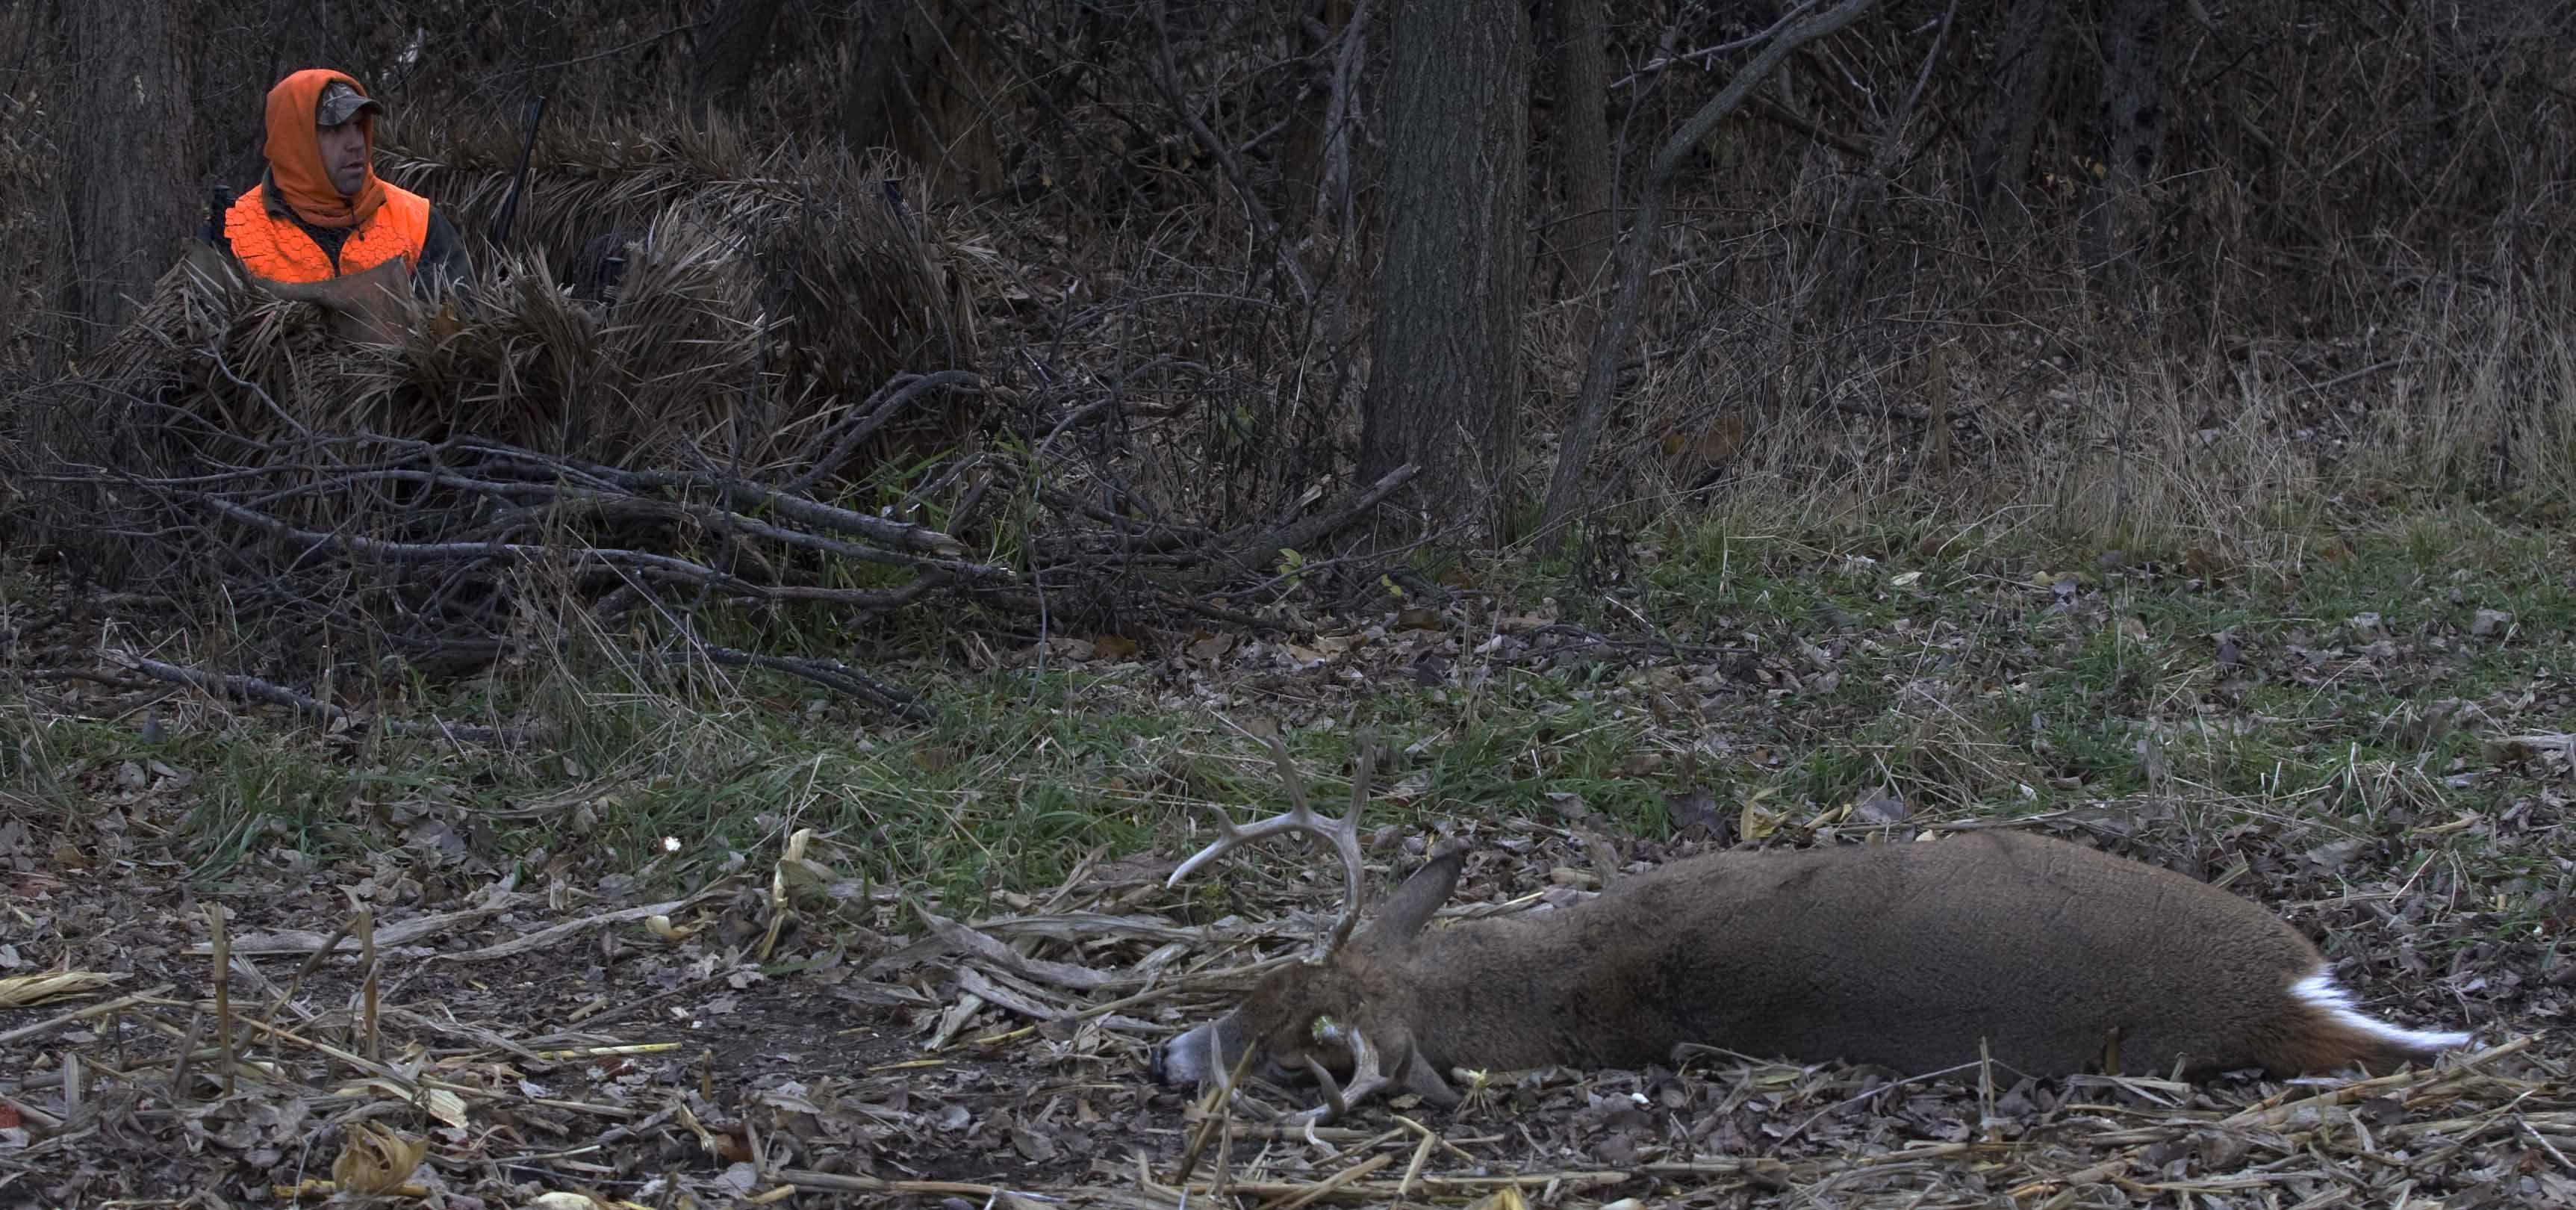 Ground Blinds For Deer Hunting